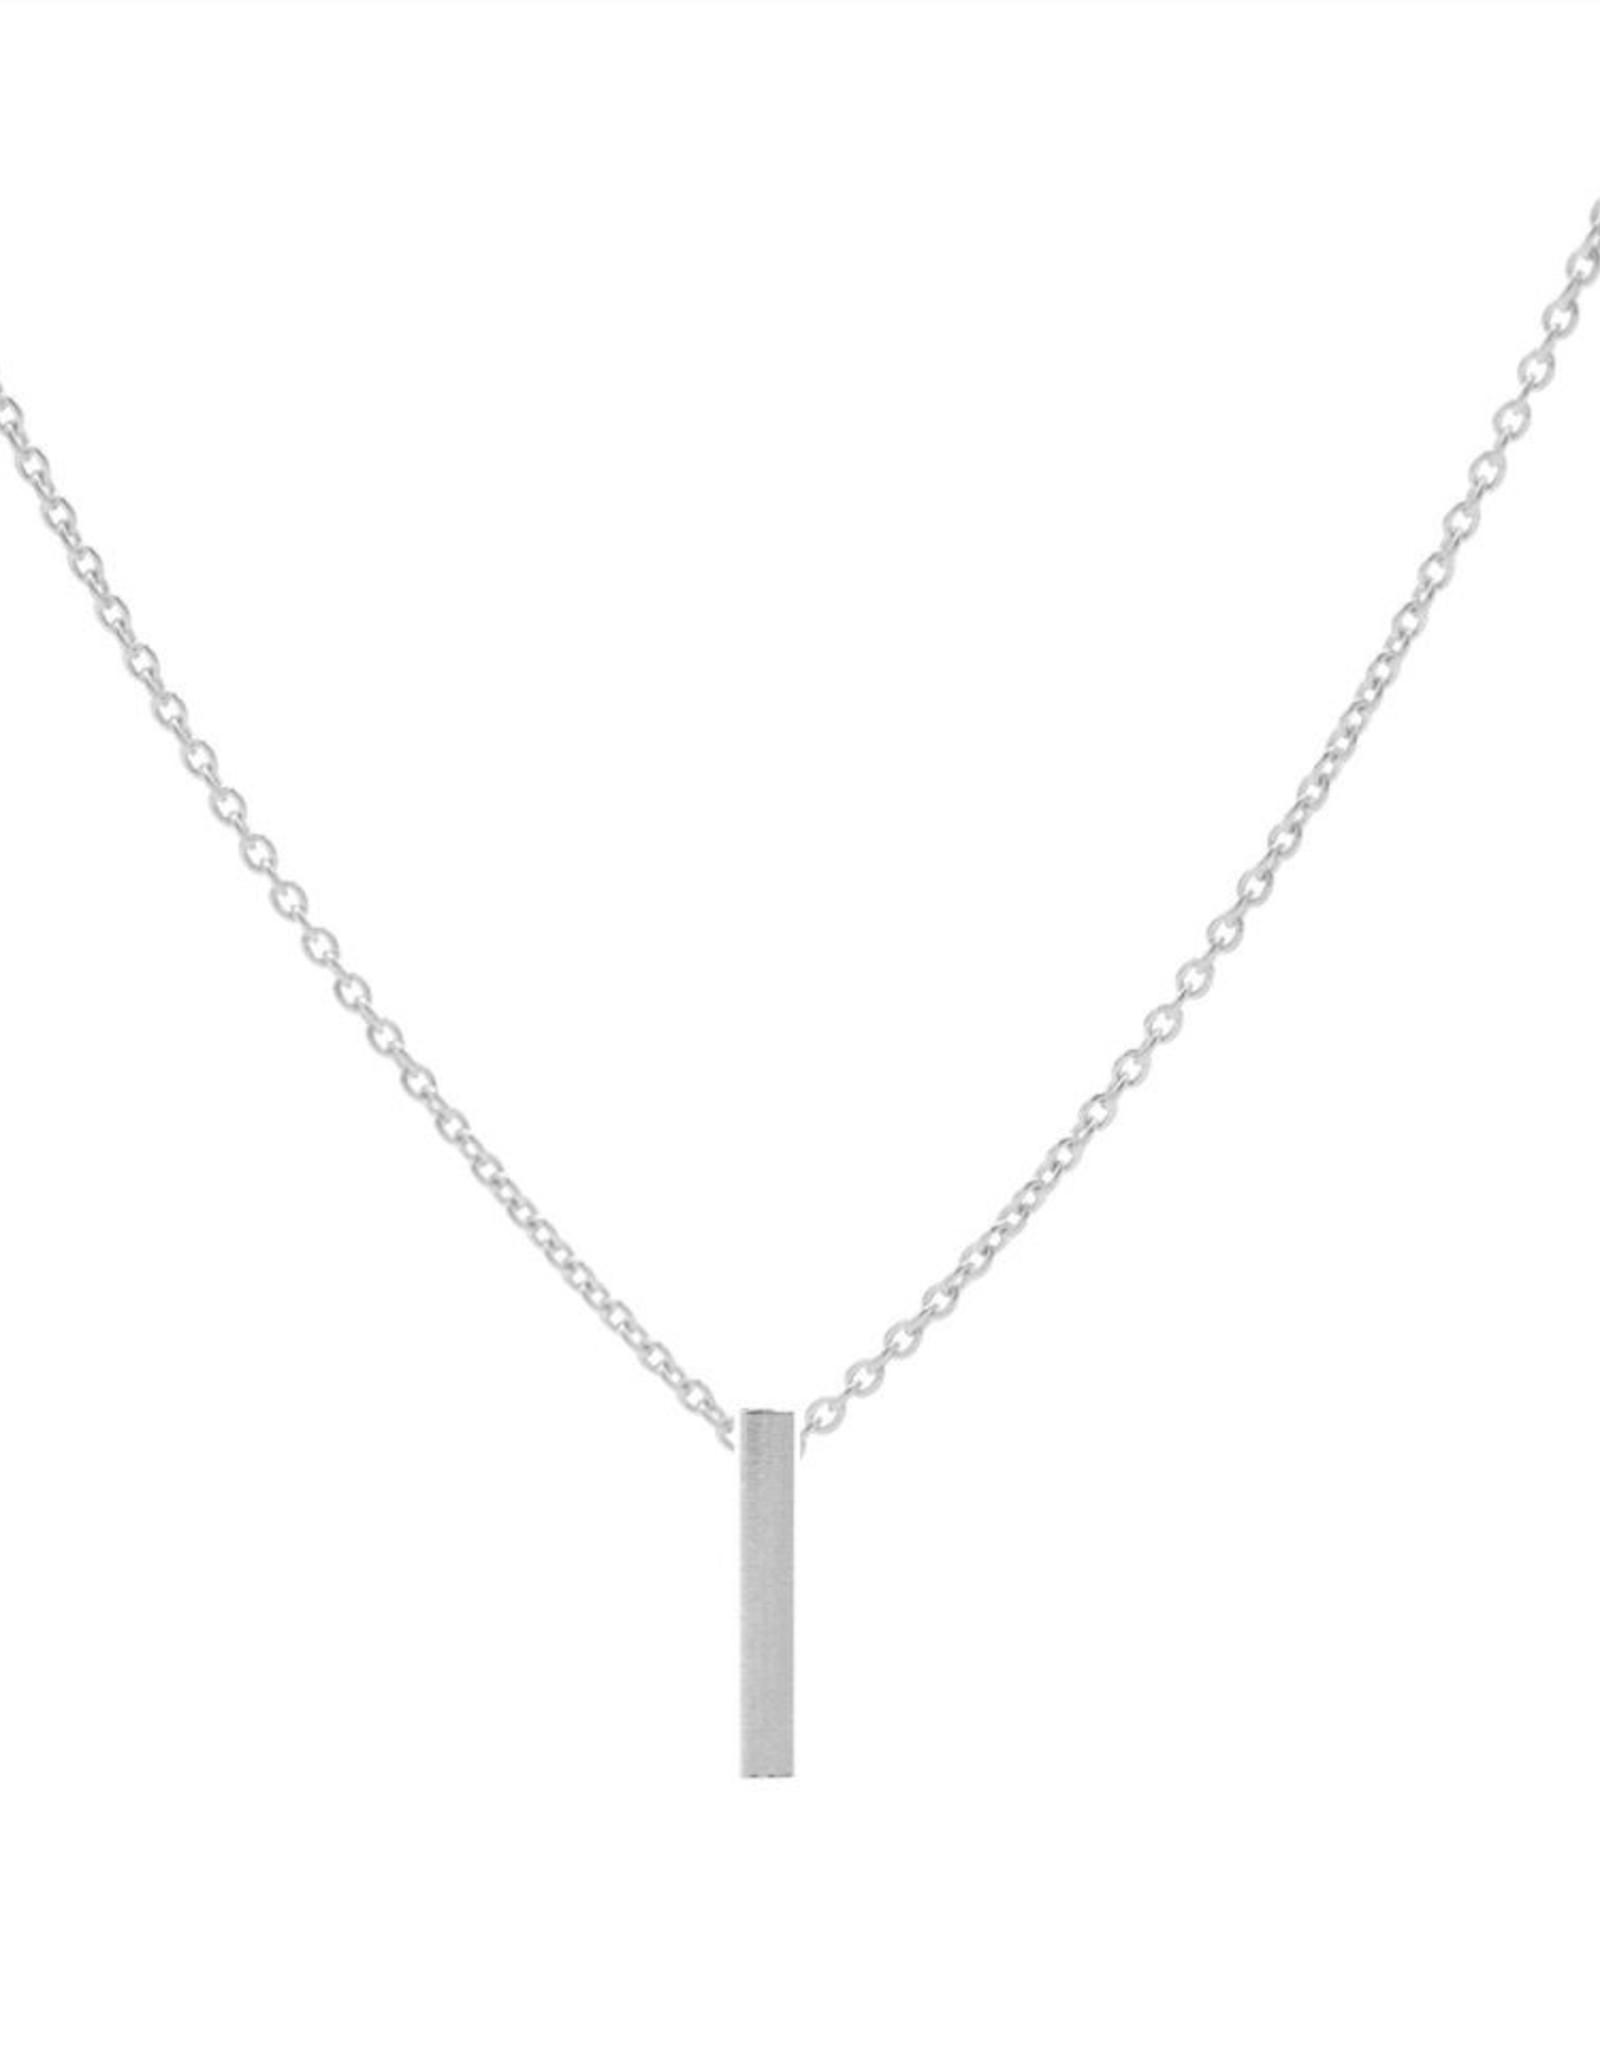 Karma Necklace Tube Vertical Silver